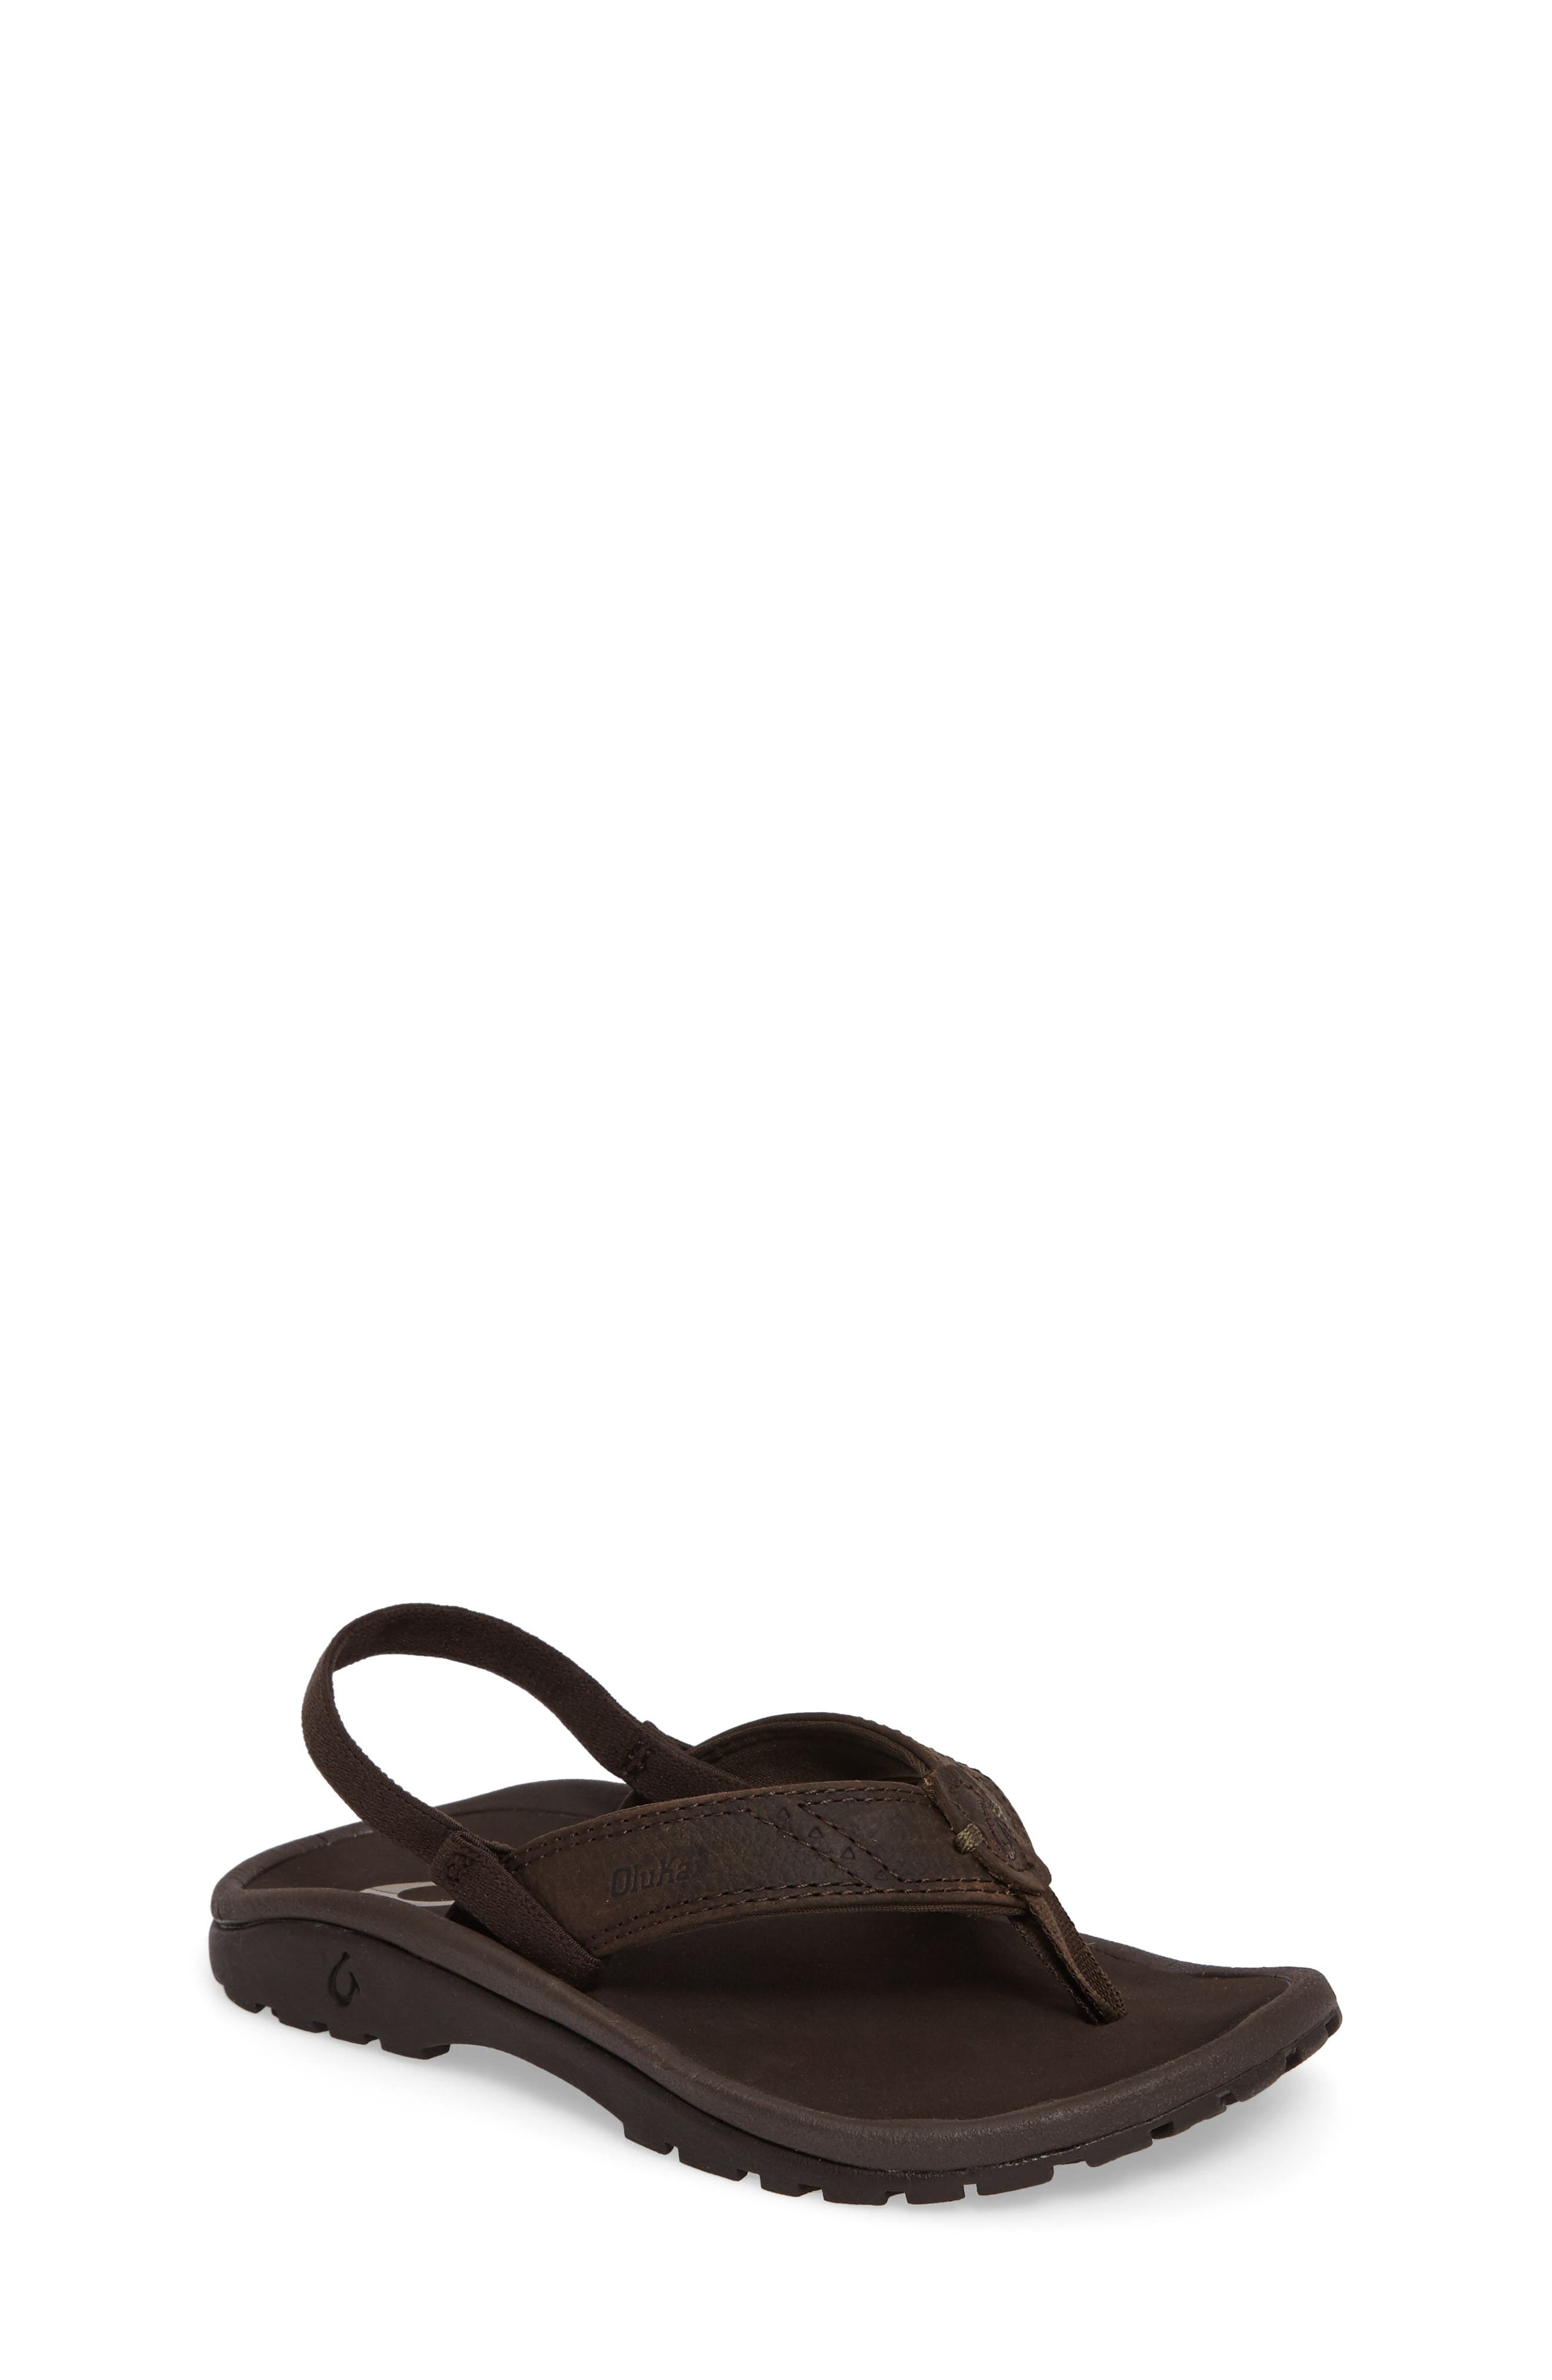 Alternate Image 1 Selected - OluKai Nui Leather Sandal (Toddler)